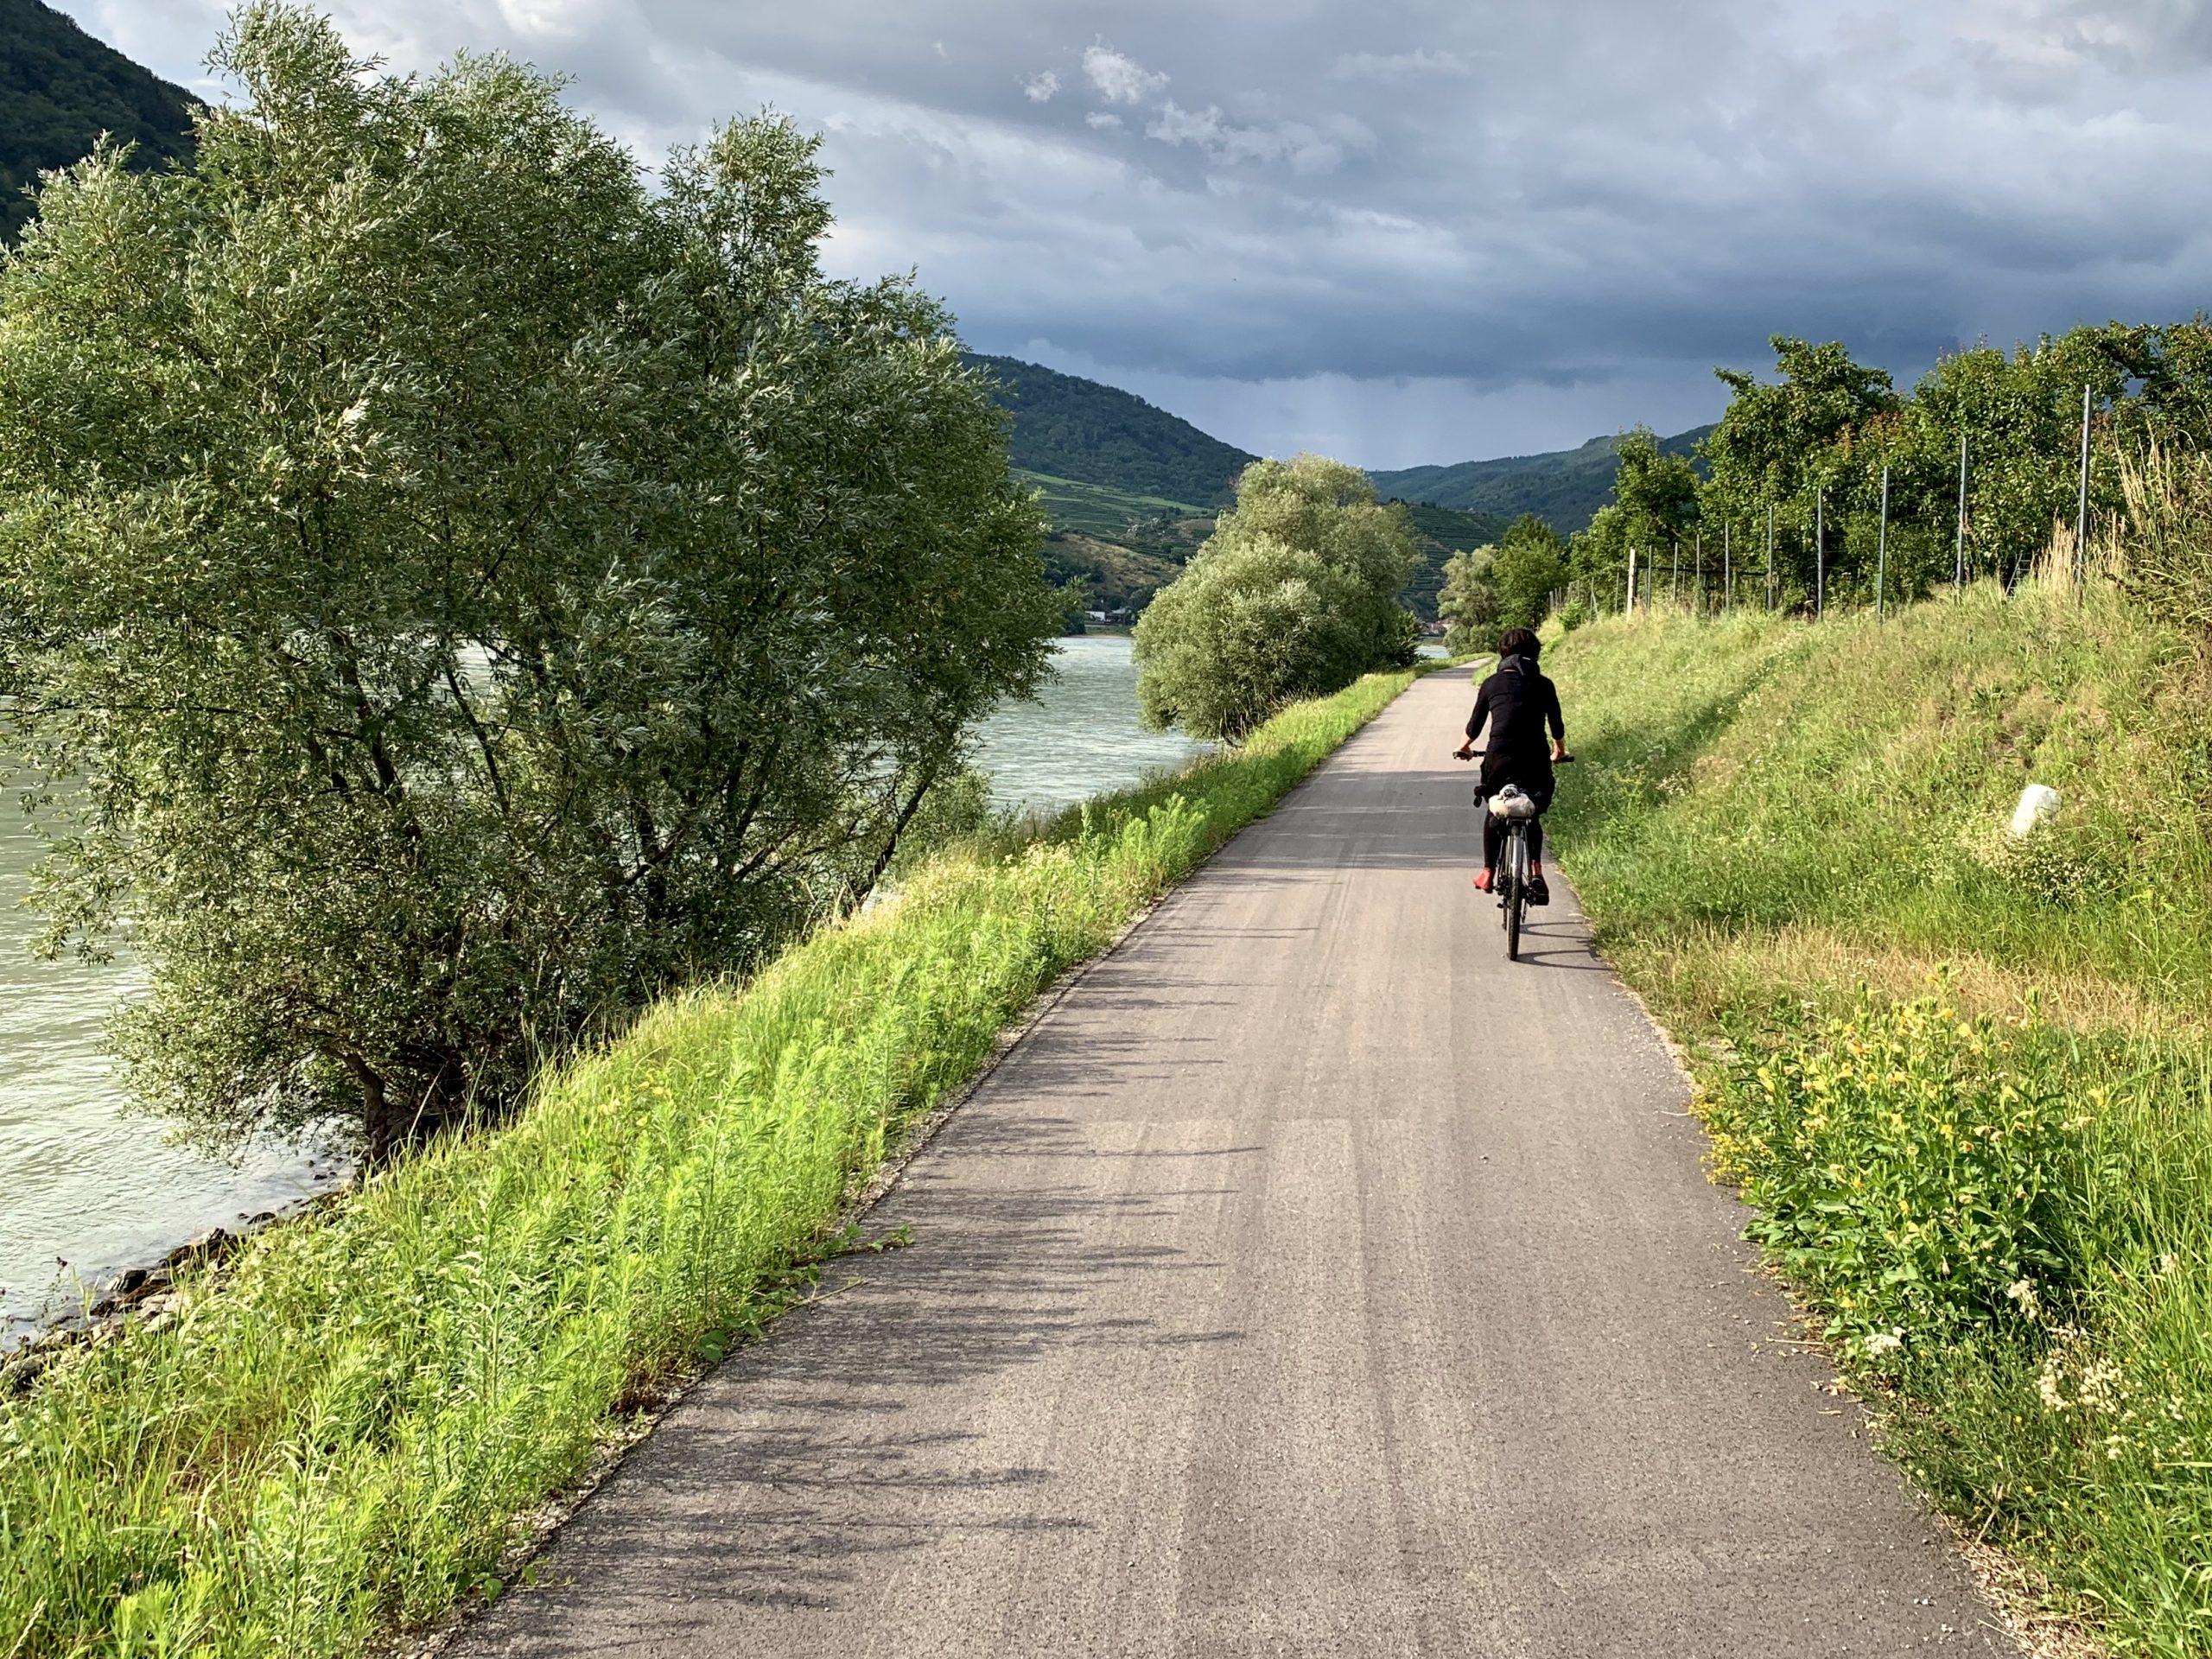 Дунавска бициклистичка стаза Пассау Беч код Арнсдорфа